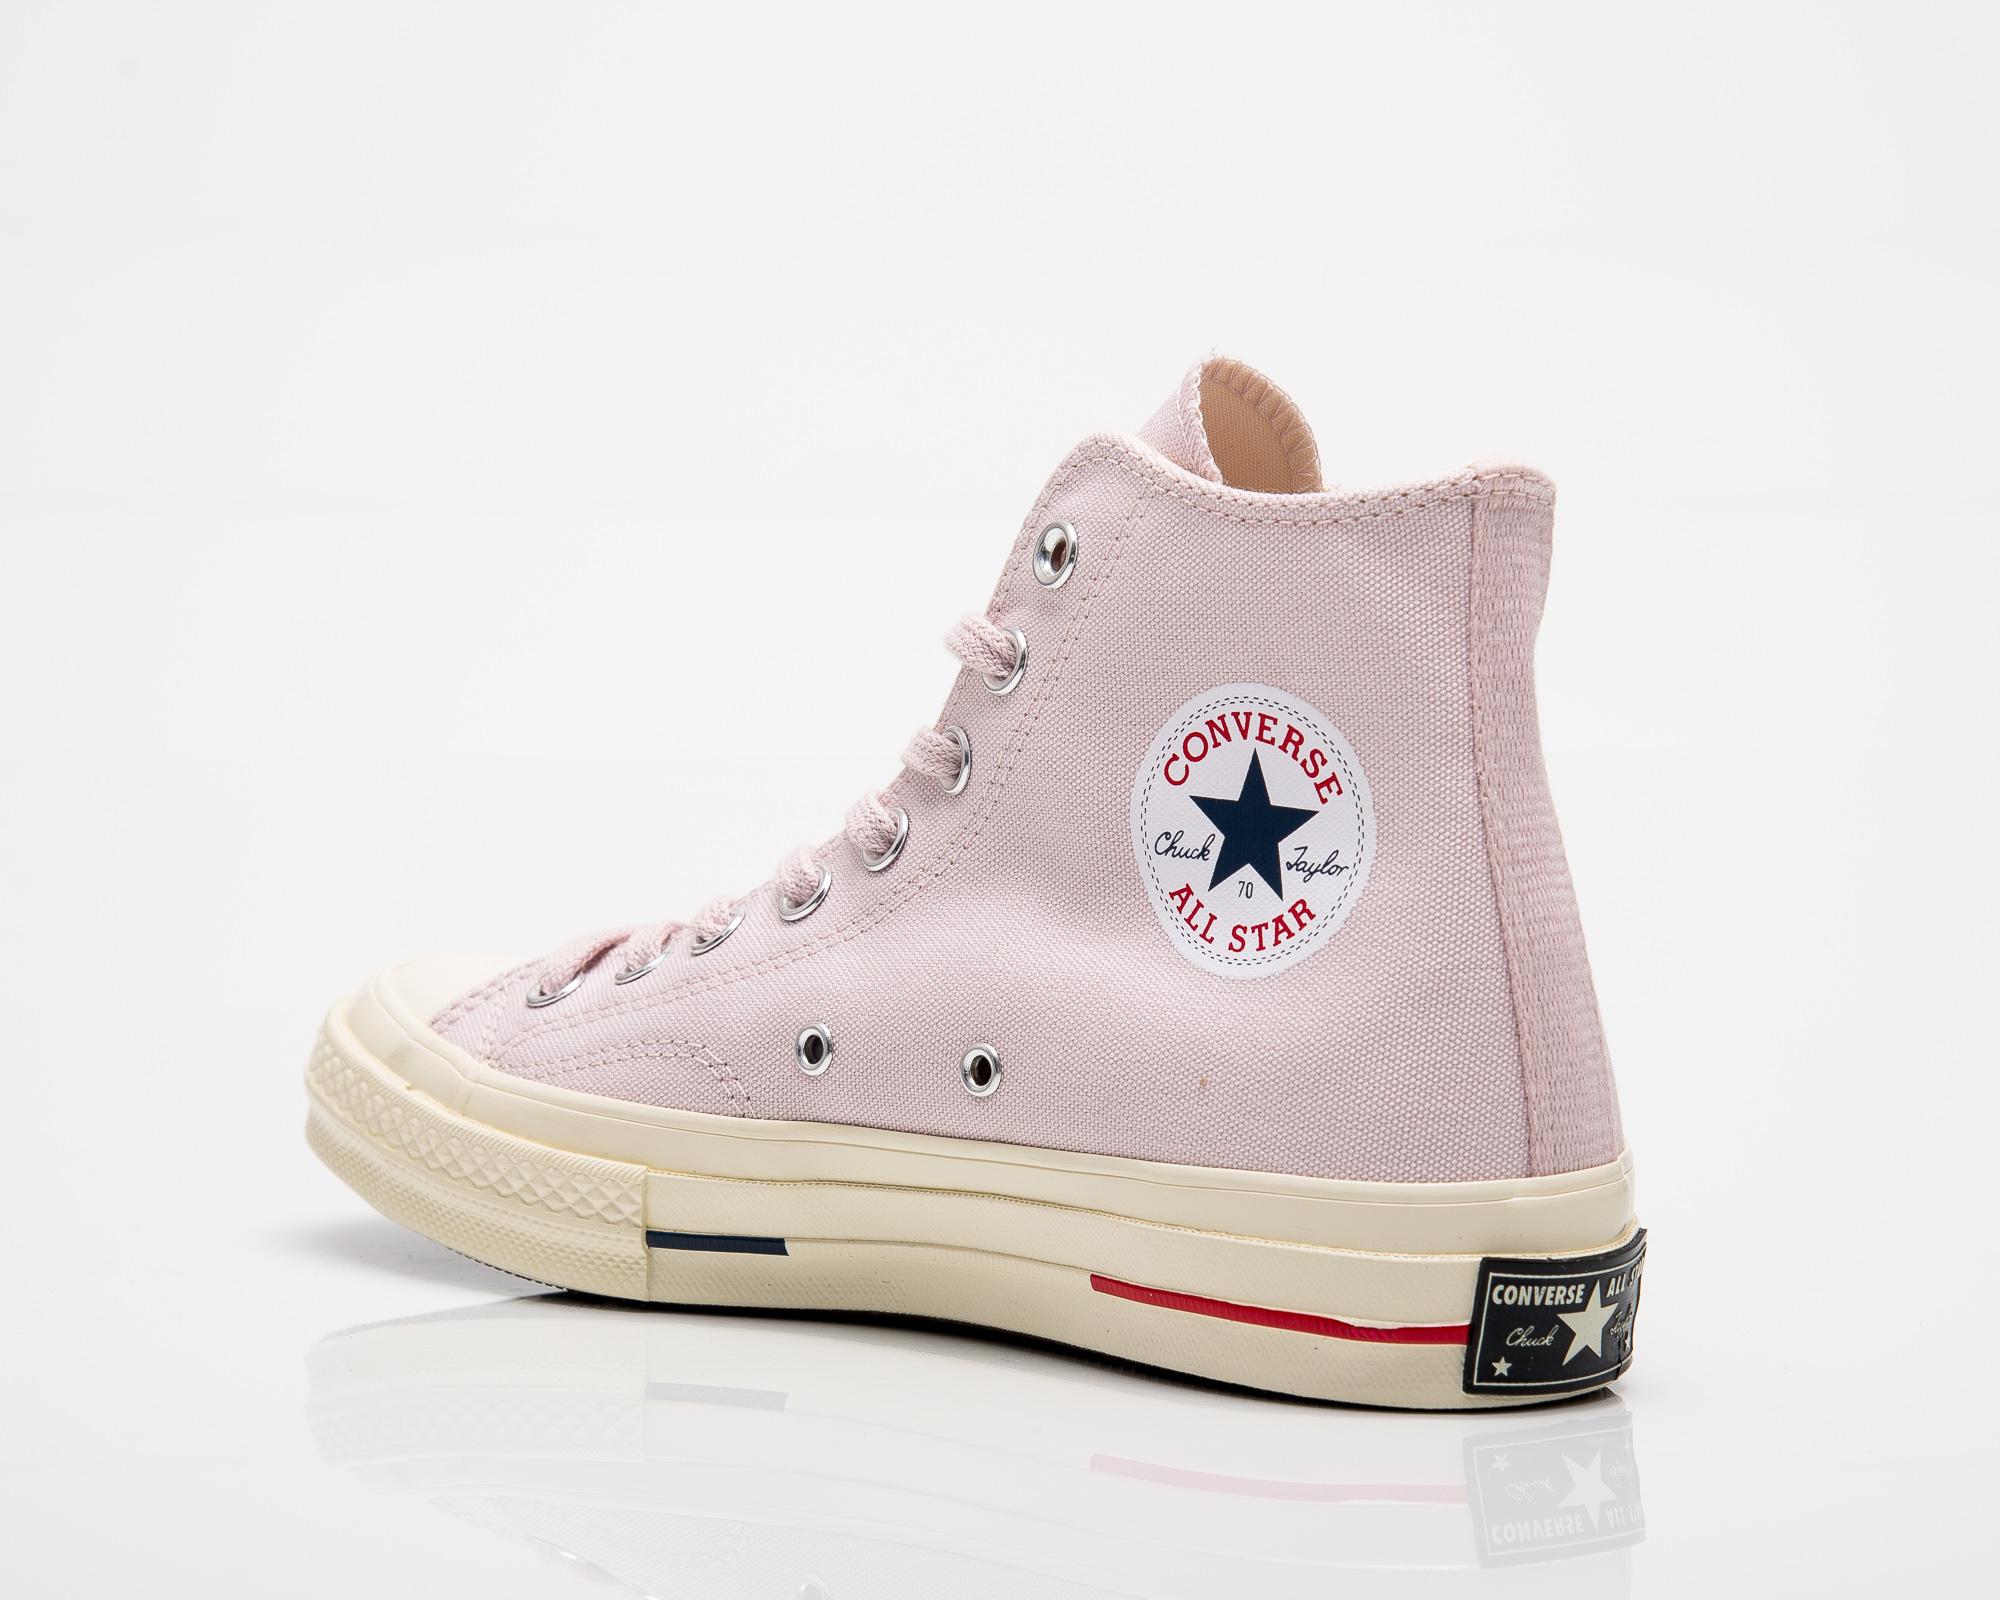 7c5e889993fb Converse All-Star Chuck Taylor  70 Hi - Shoes Casual - Sporting ...